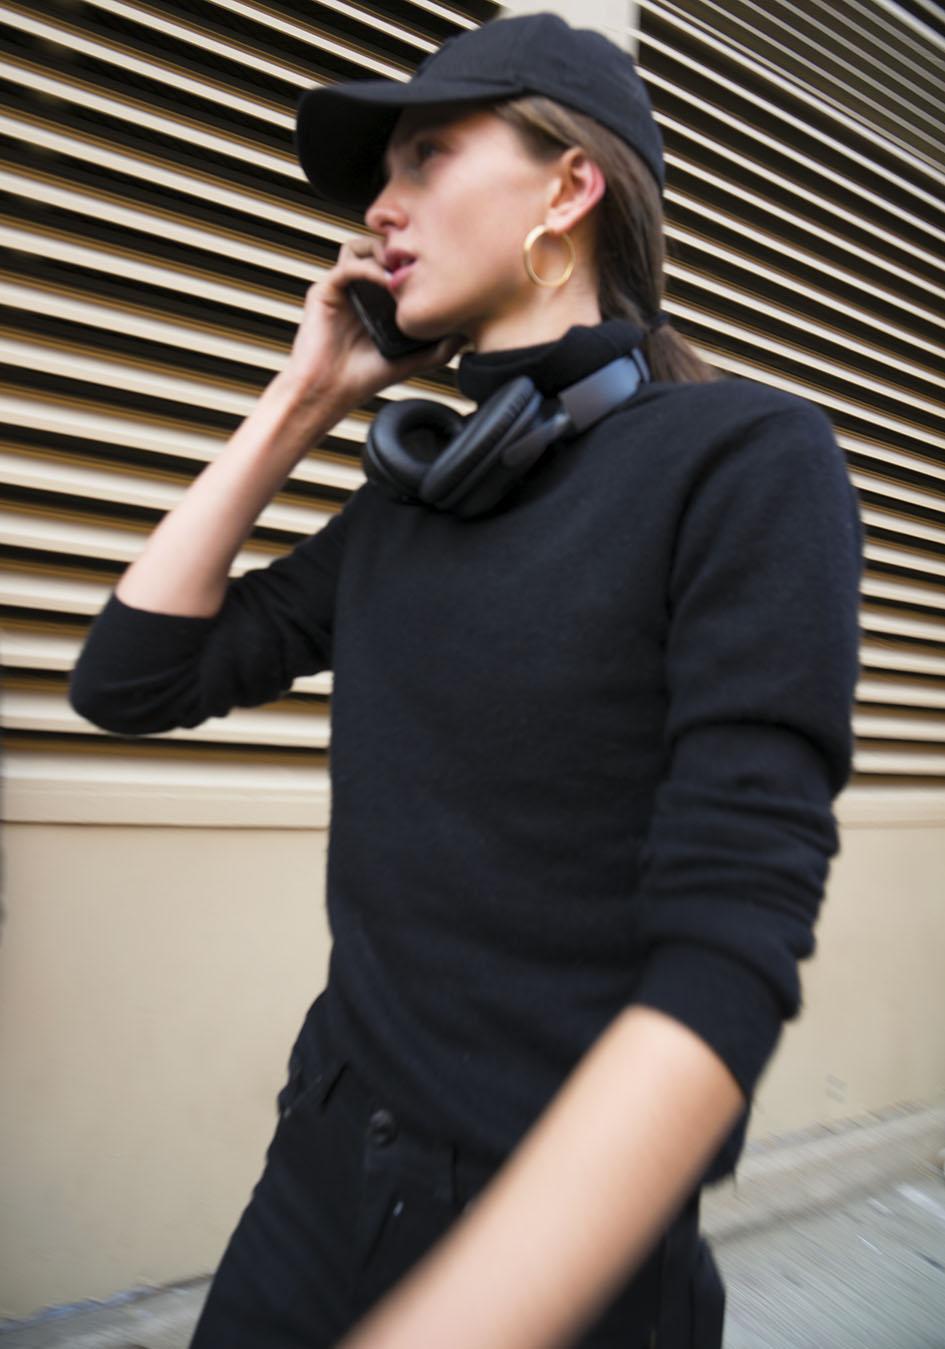 Noa_Baker_street_fashion_photography_new_york_hats_headphones